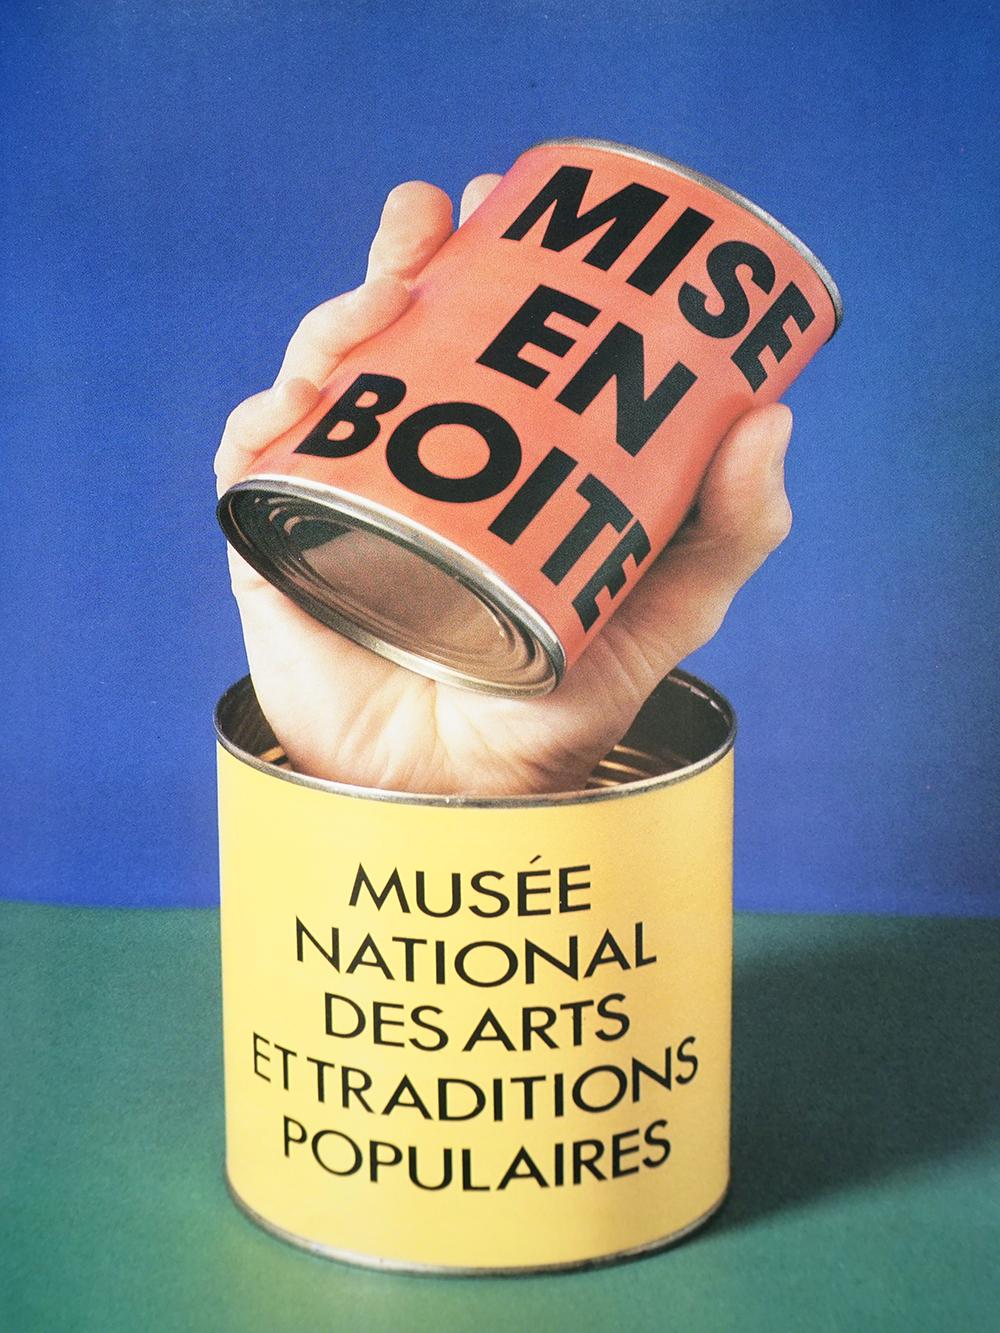 1994-Mise-en-boite-c-baillargeon-web.jpg